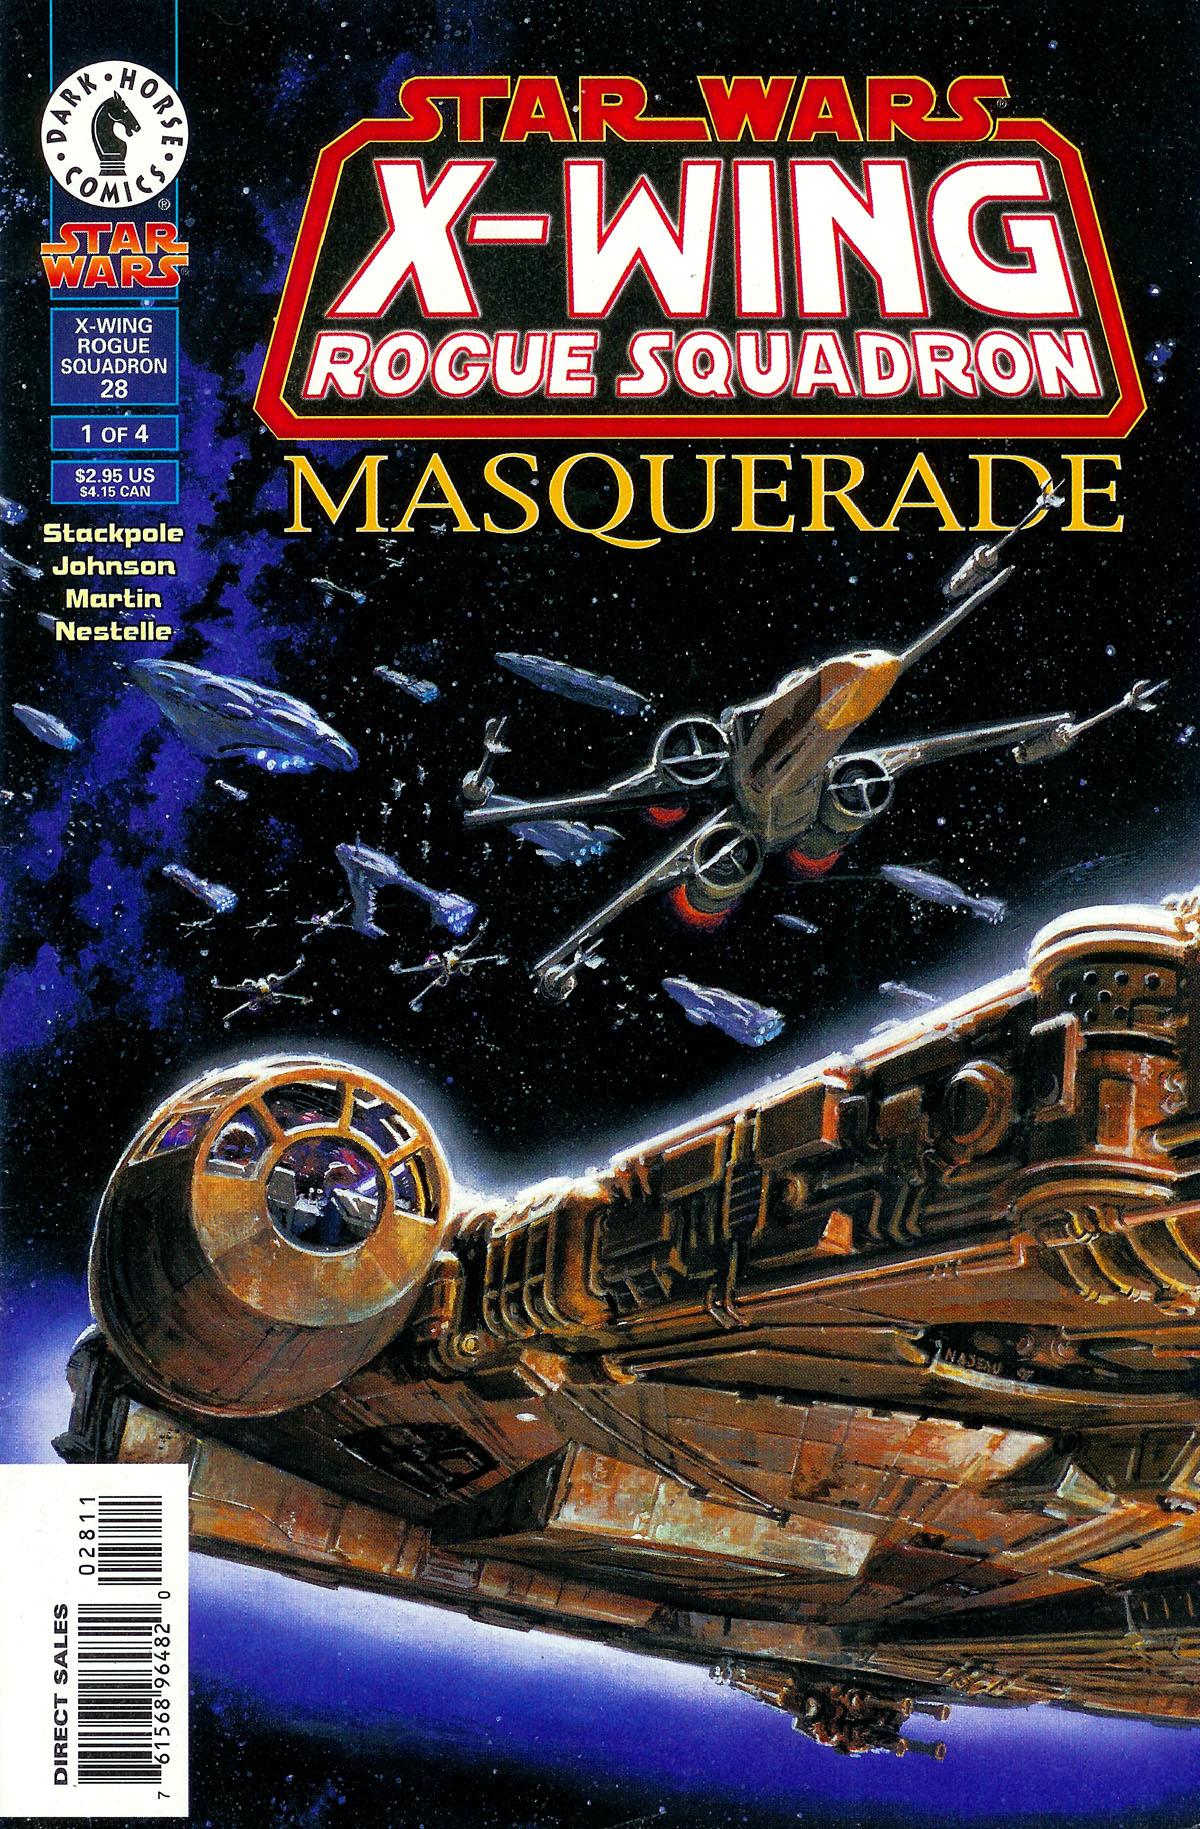 Star Wars: X-Wing Rogue Squadron: Masquerade   Wookieepedia